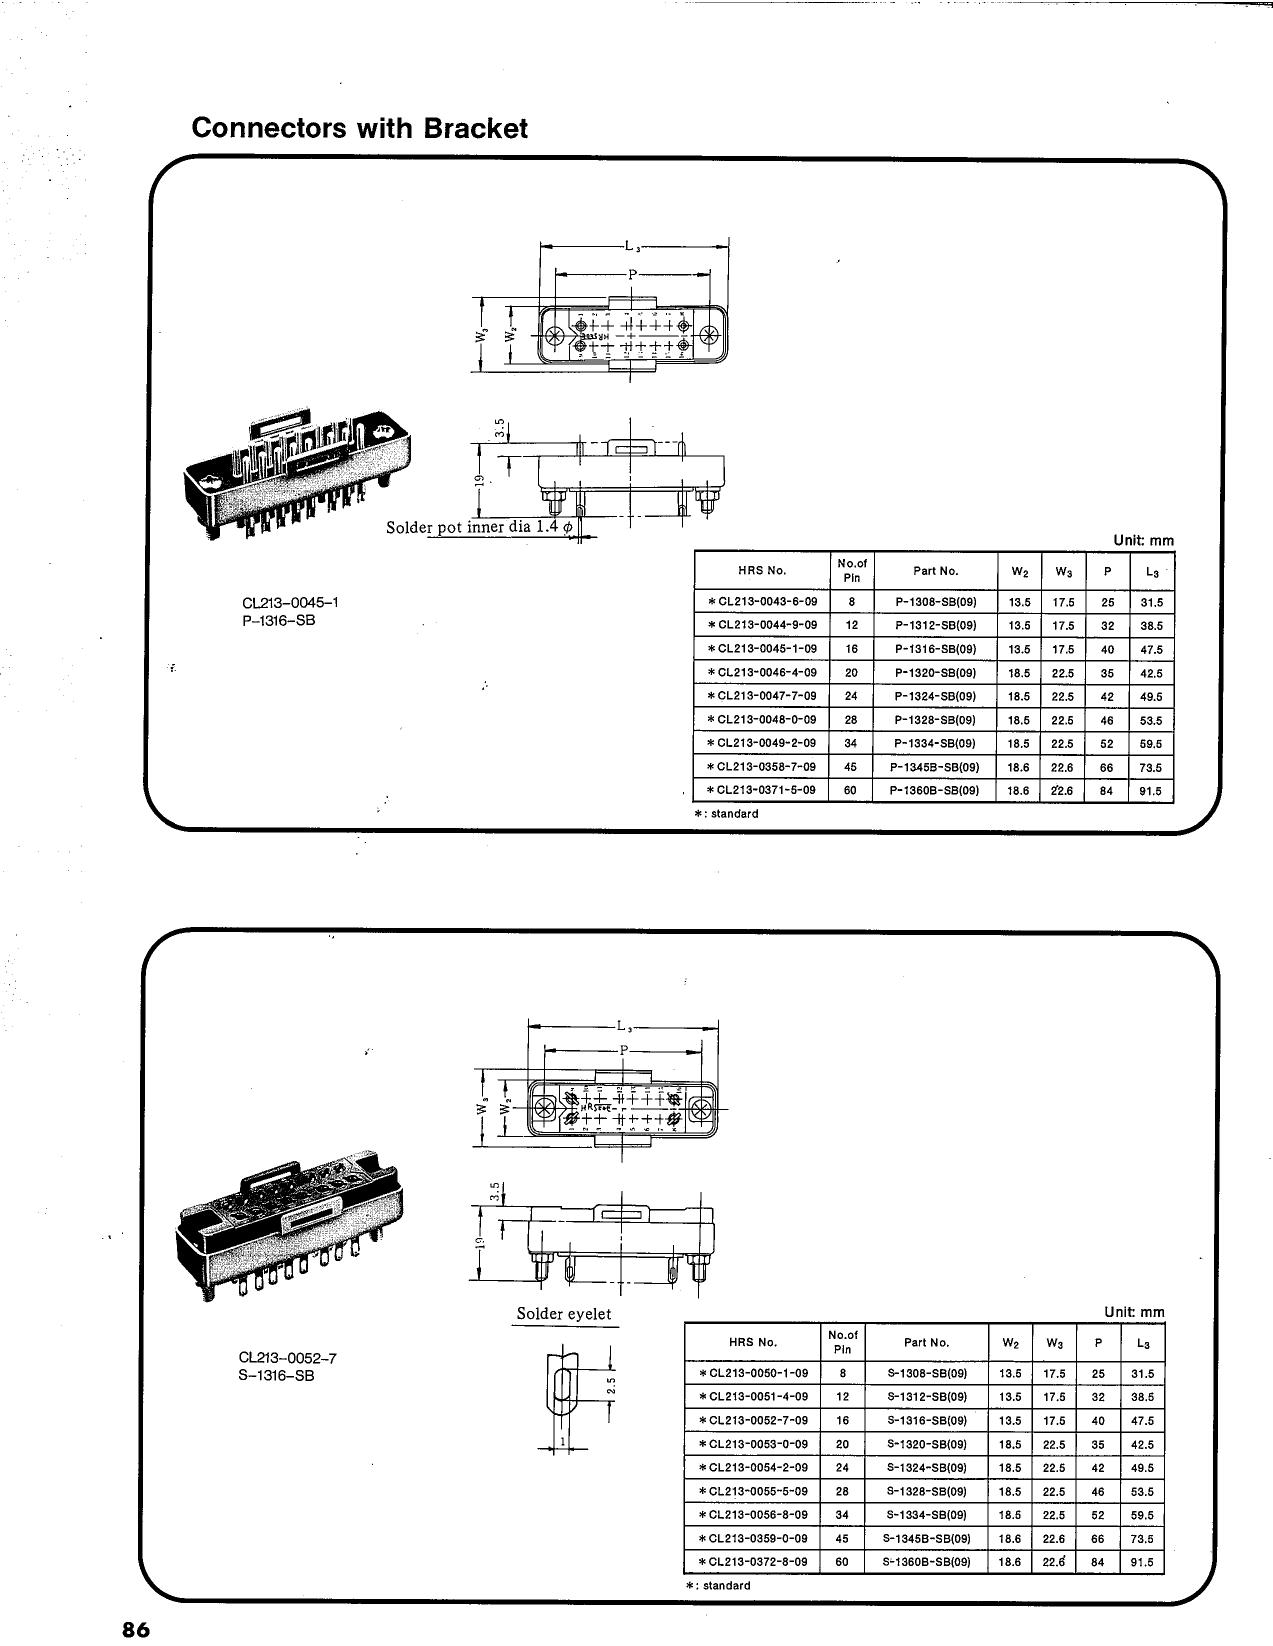 S-1360-H pdf